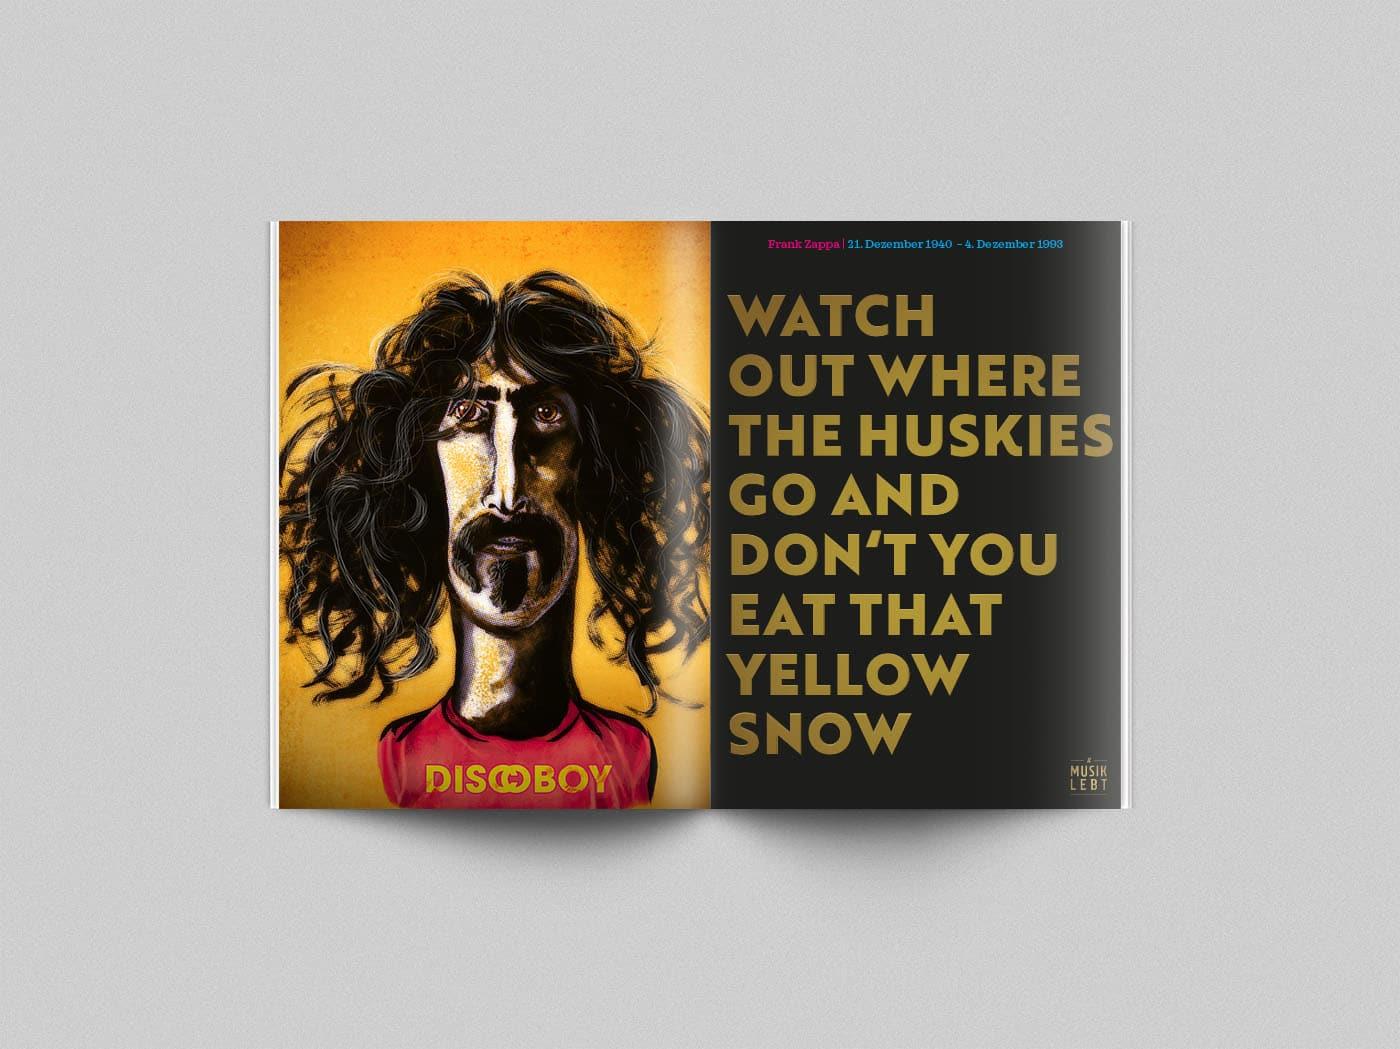 Musik lebt – Frank Zappa